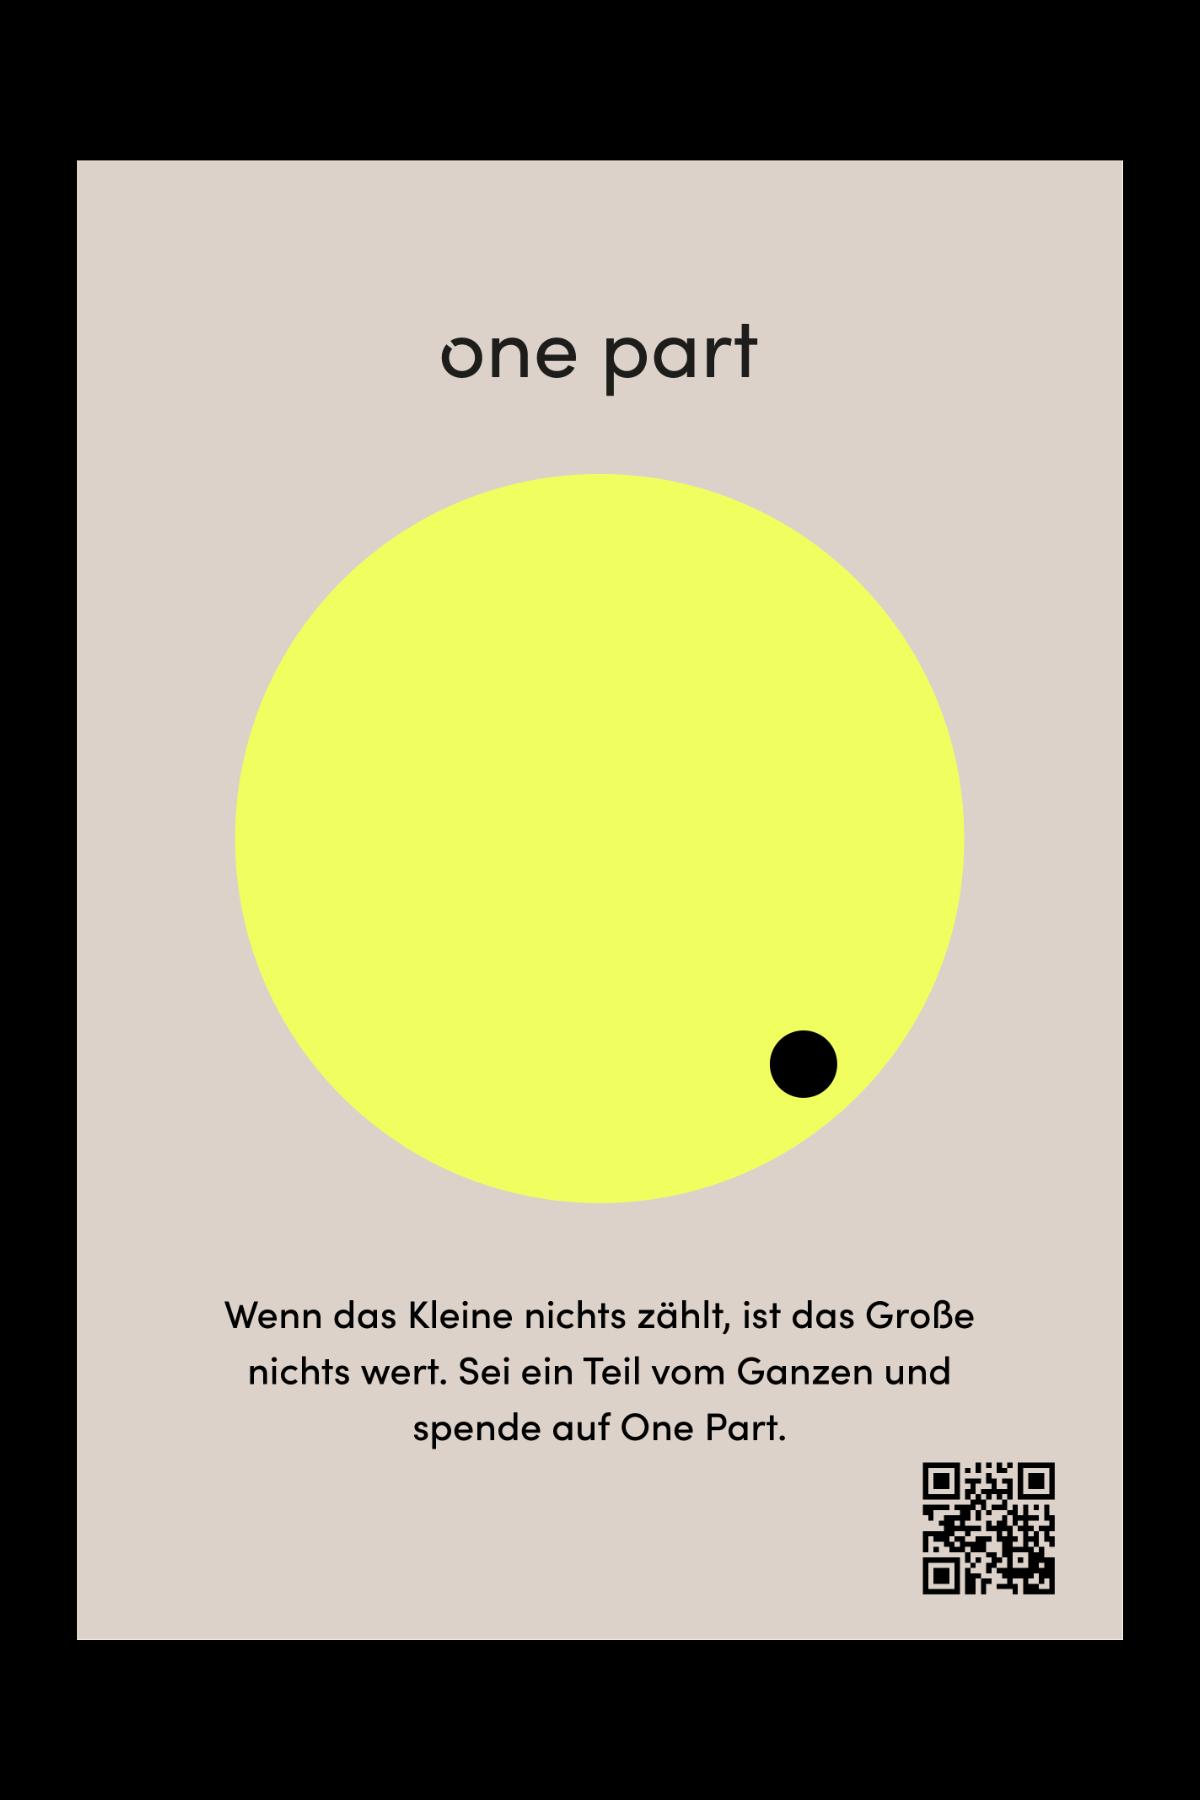 4 Stella Butz One Part Diplomrojekt Meisterschule Plakat hf